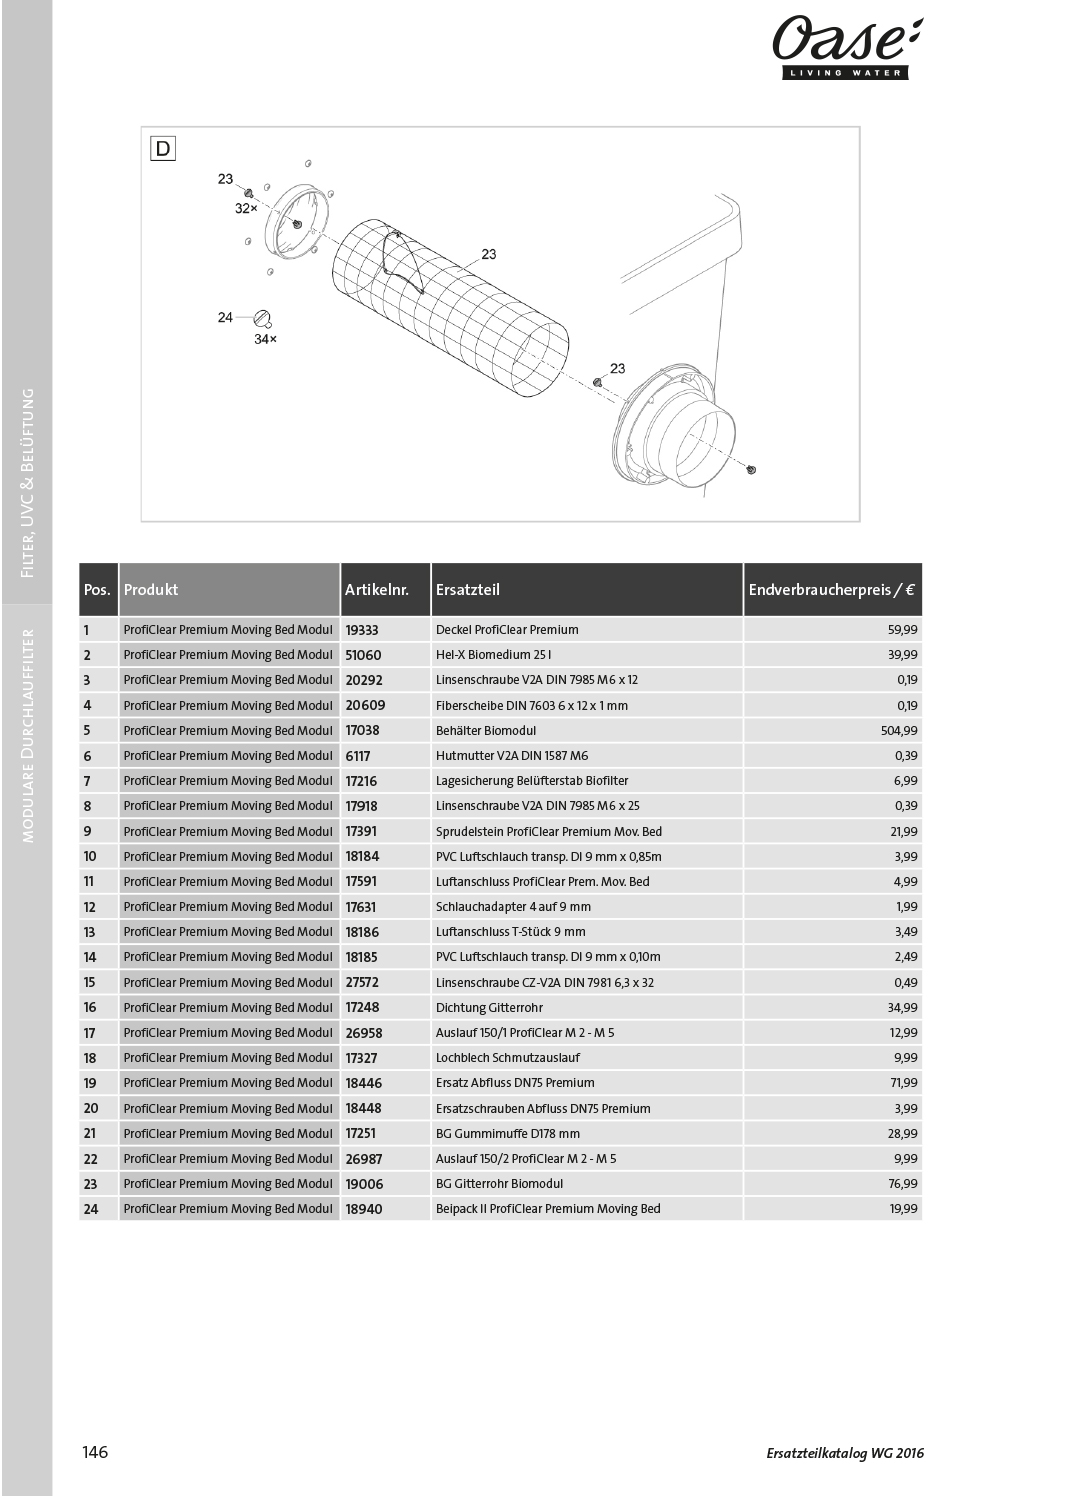 Oase ProfiClear Premium TF-L Gravitation EGC | oase-teichbau.de